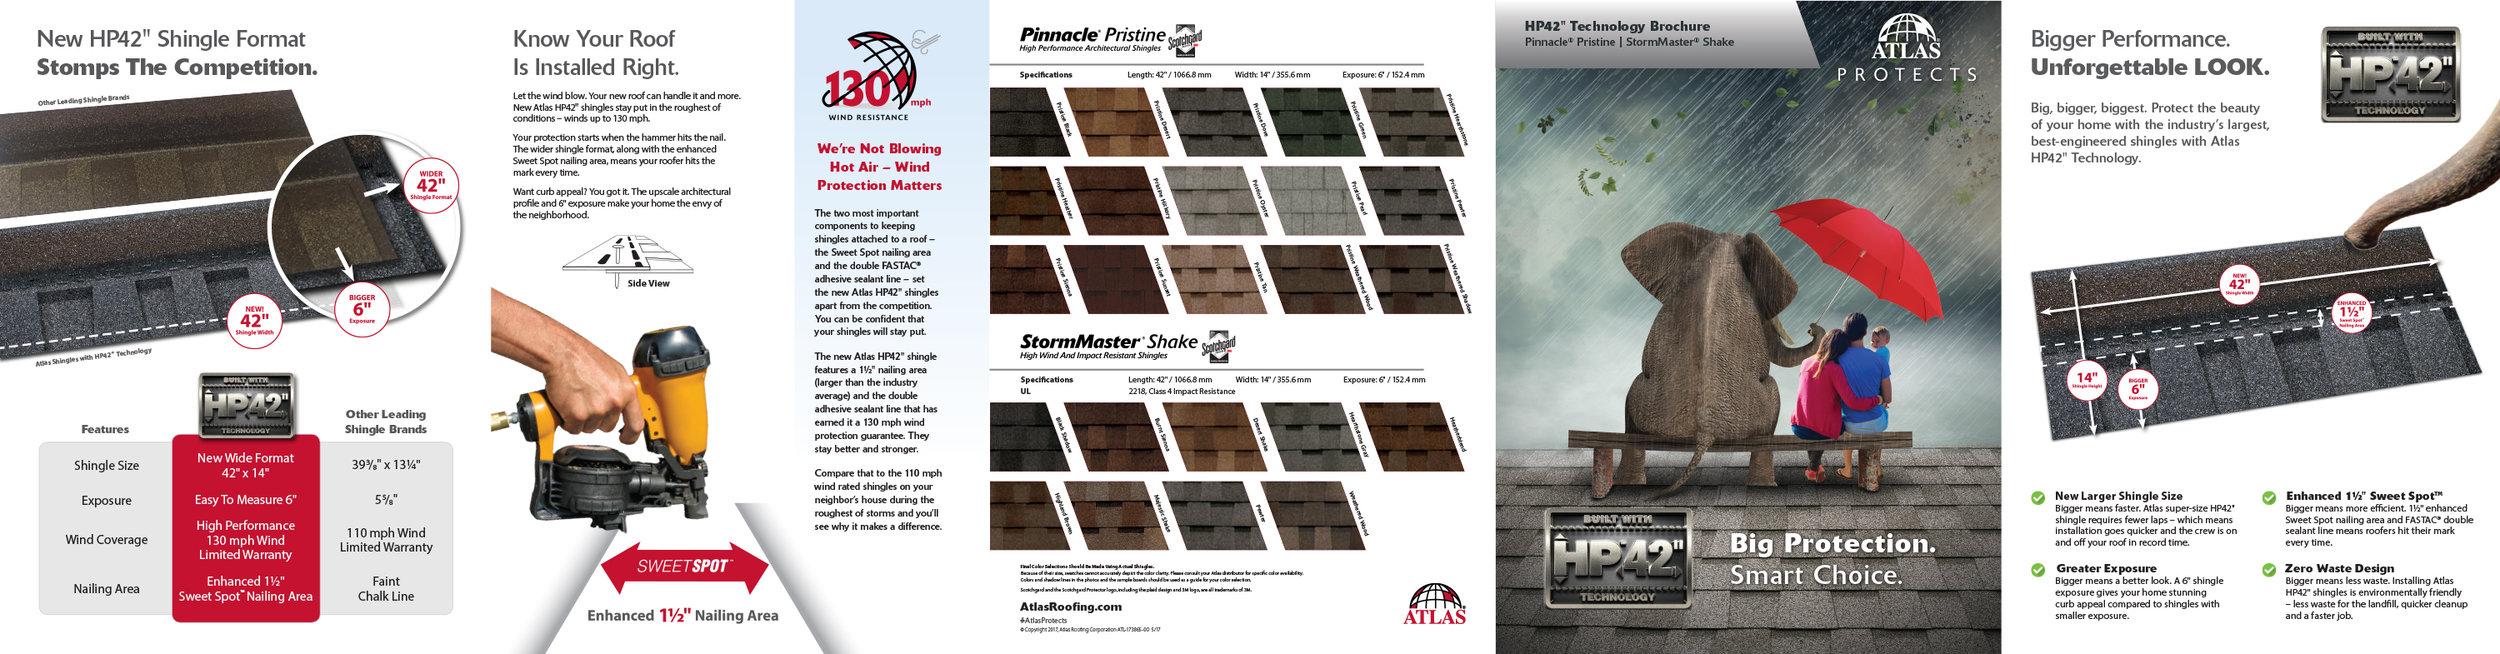 atlas-brochure-1.jpg